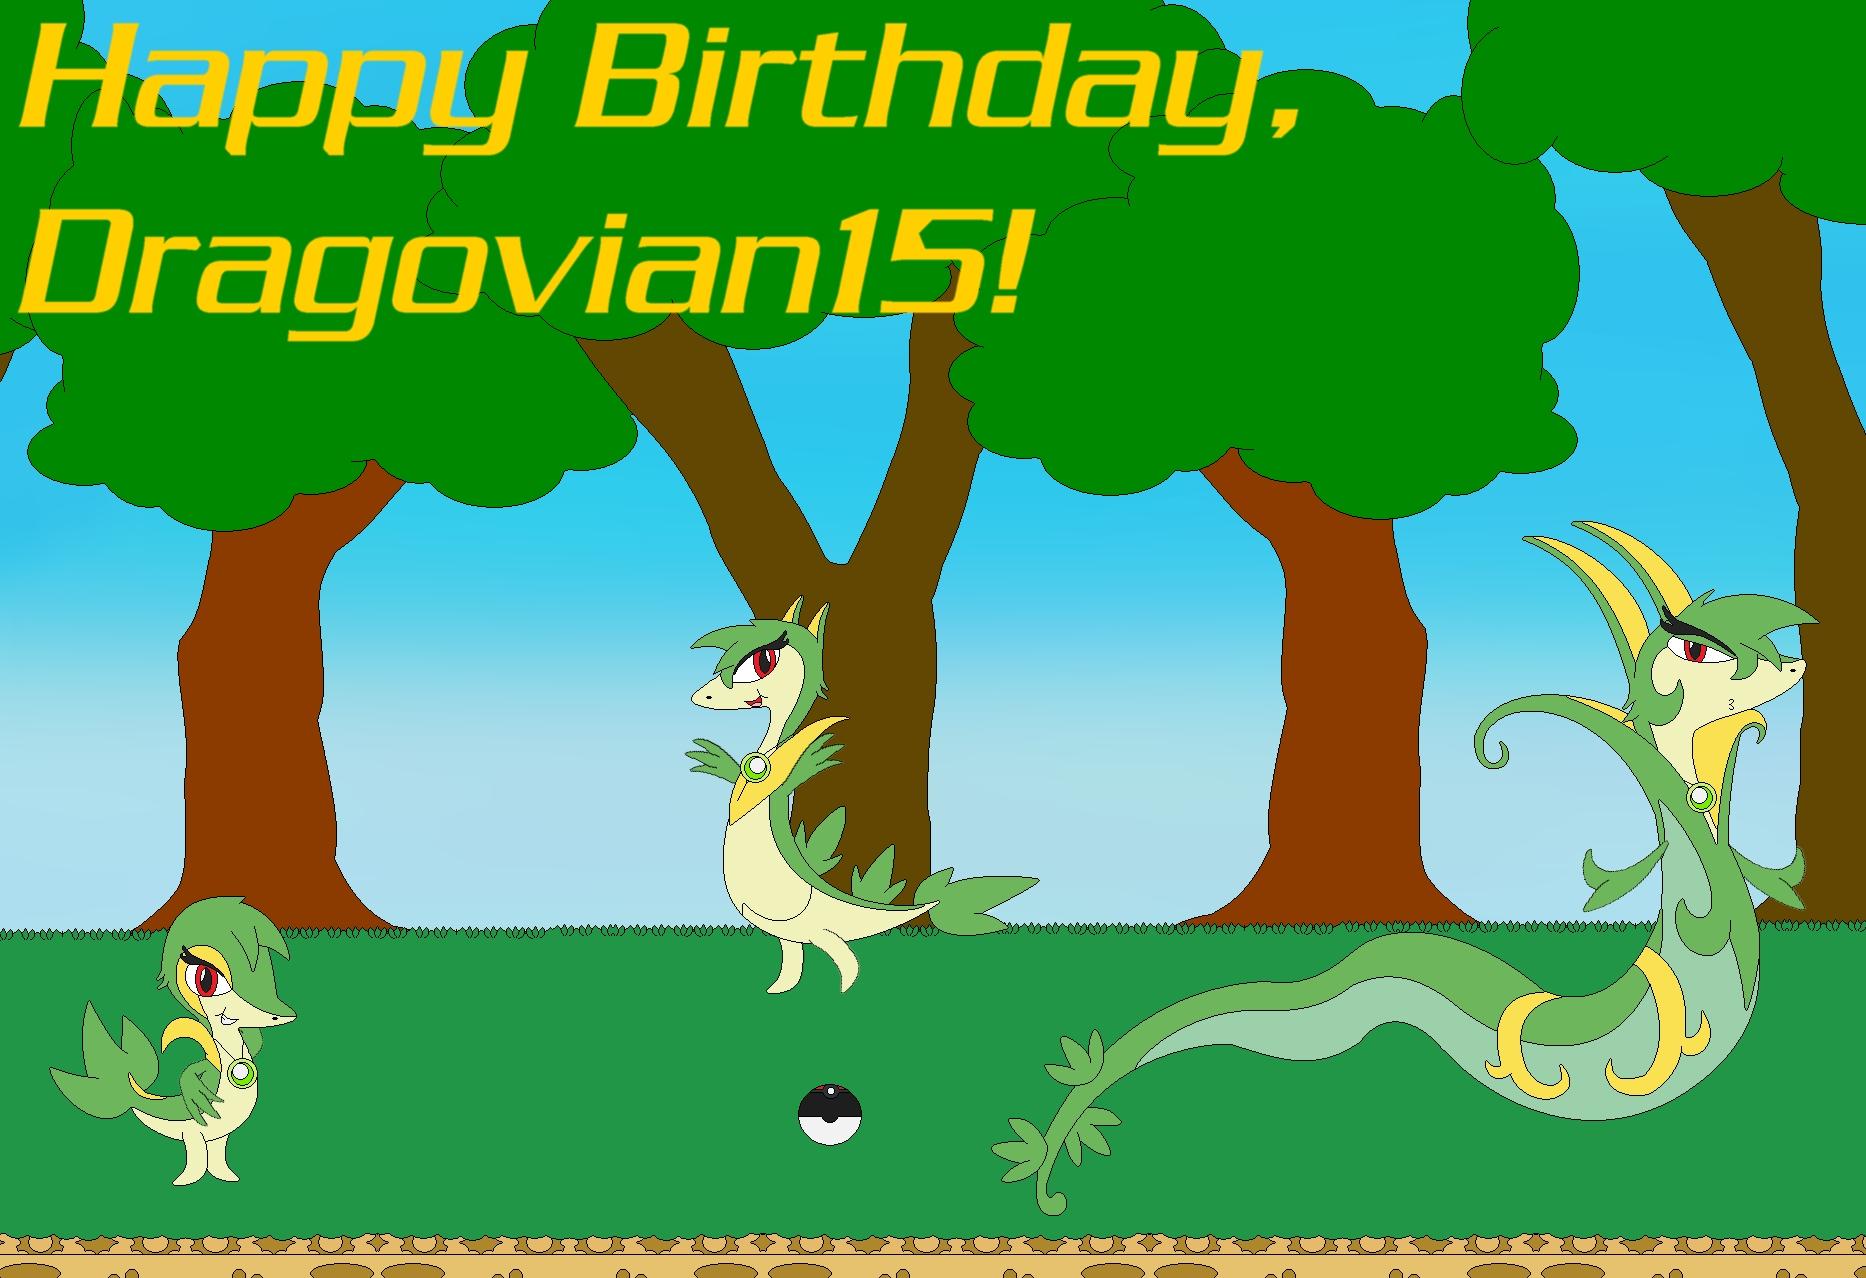 Sonic Burp Vore: Happy Birthday Dragovian By Kphoria On DeviantArt